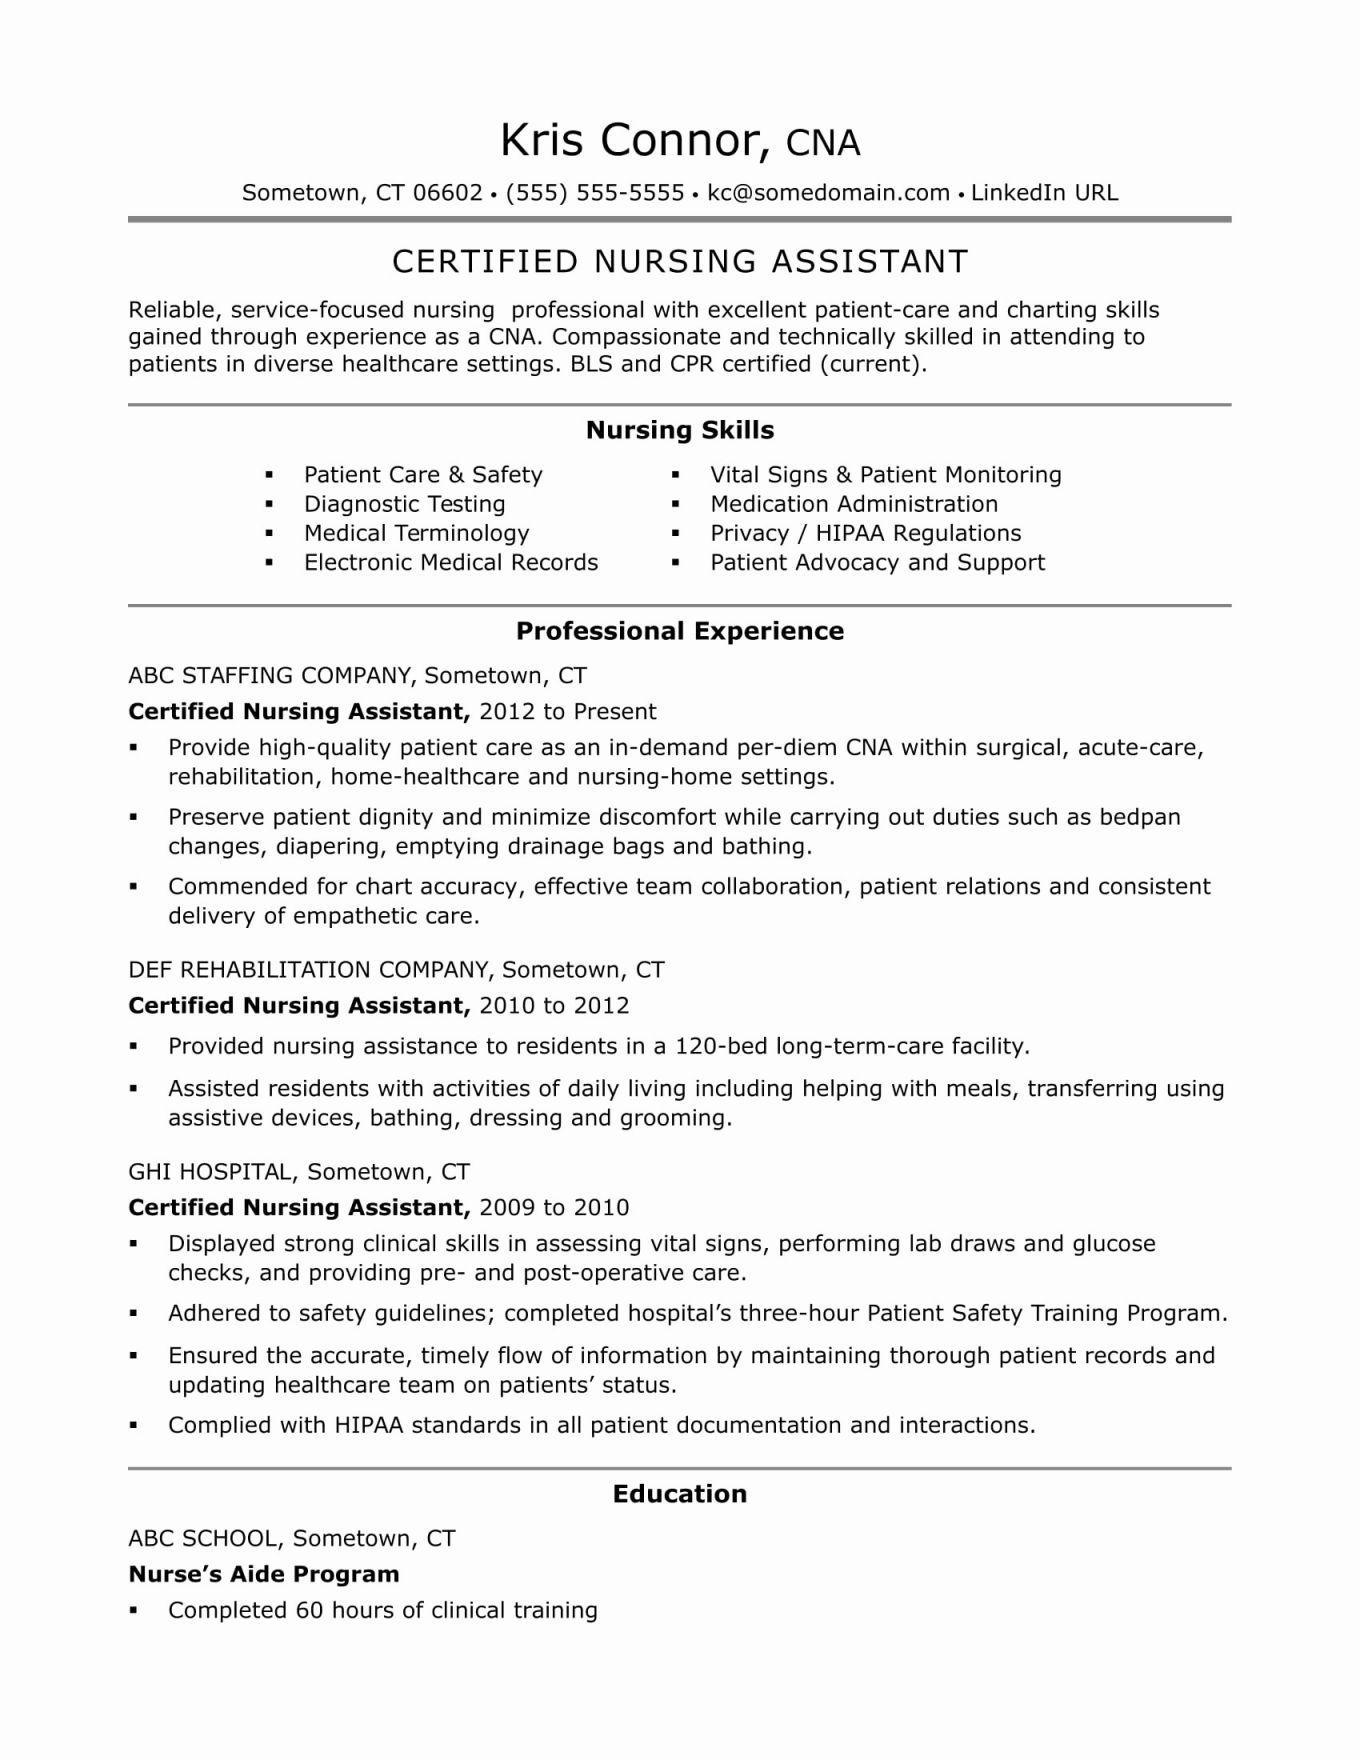 Special Skills For Resume Nursing Assistant